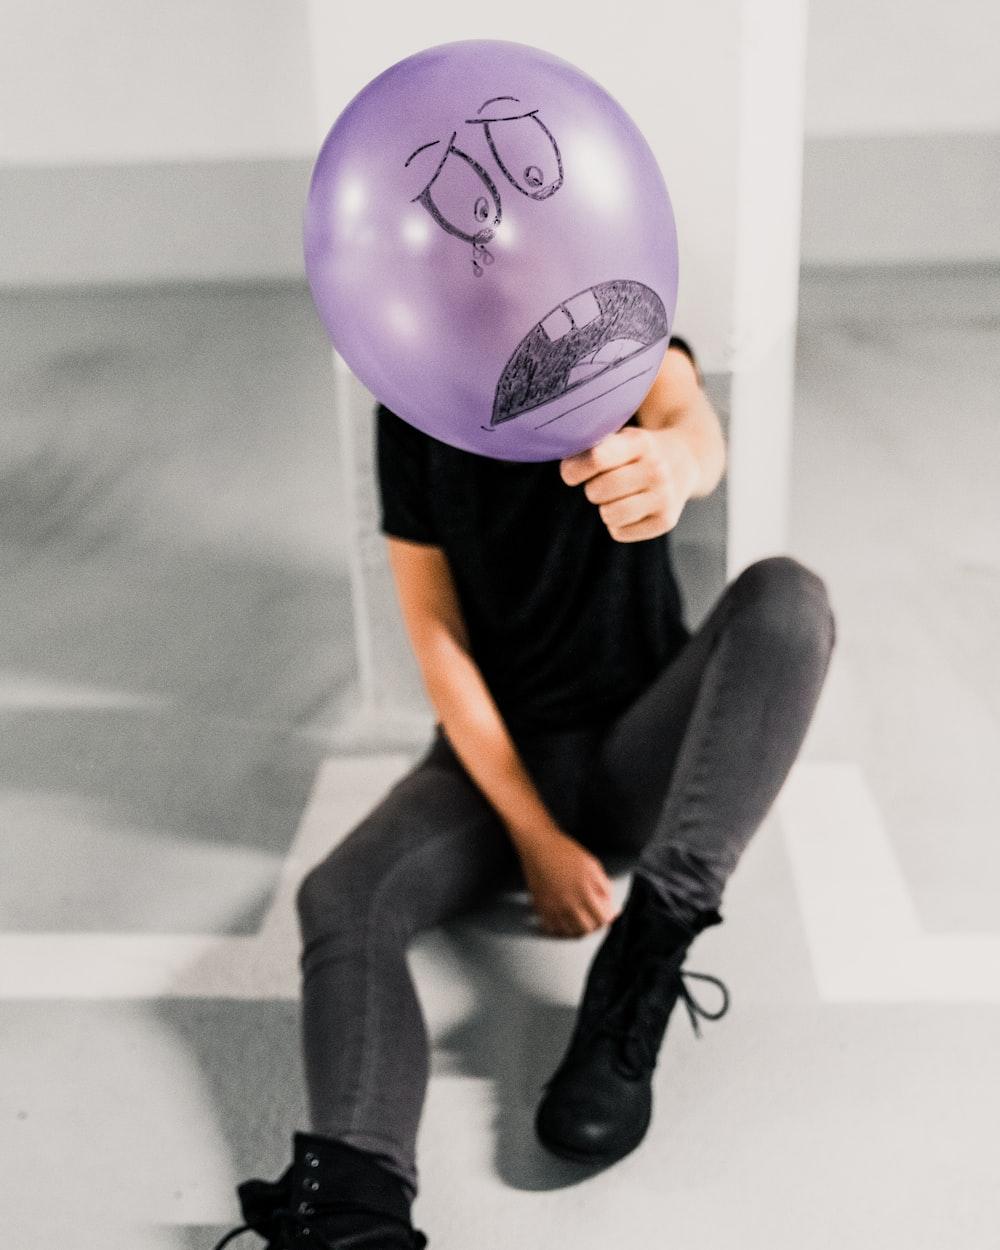 sitting man holding sad balloon